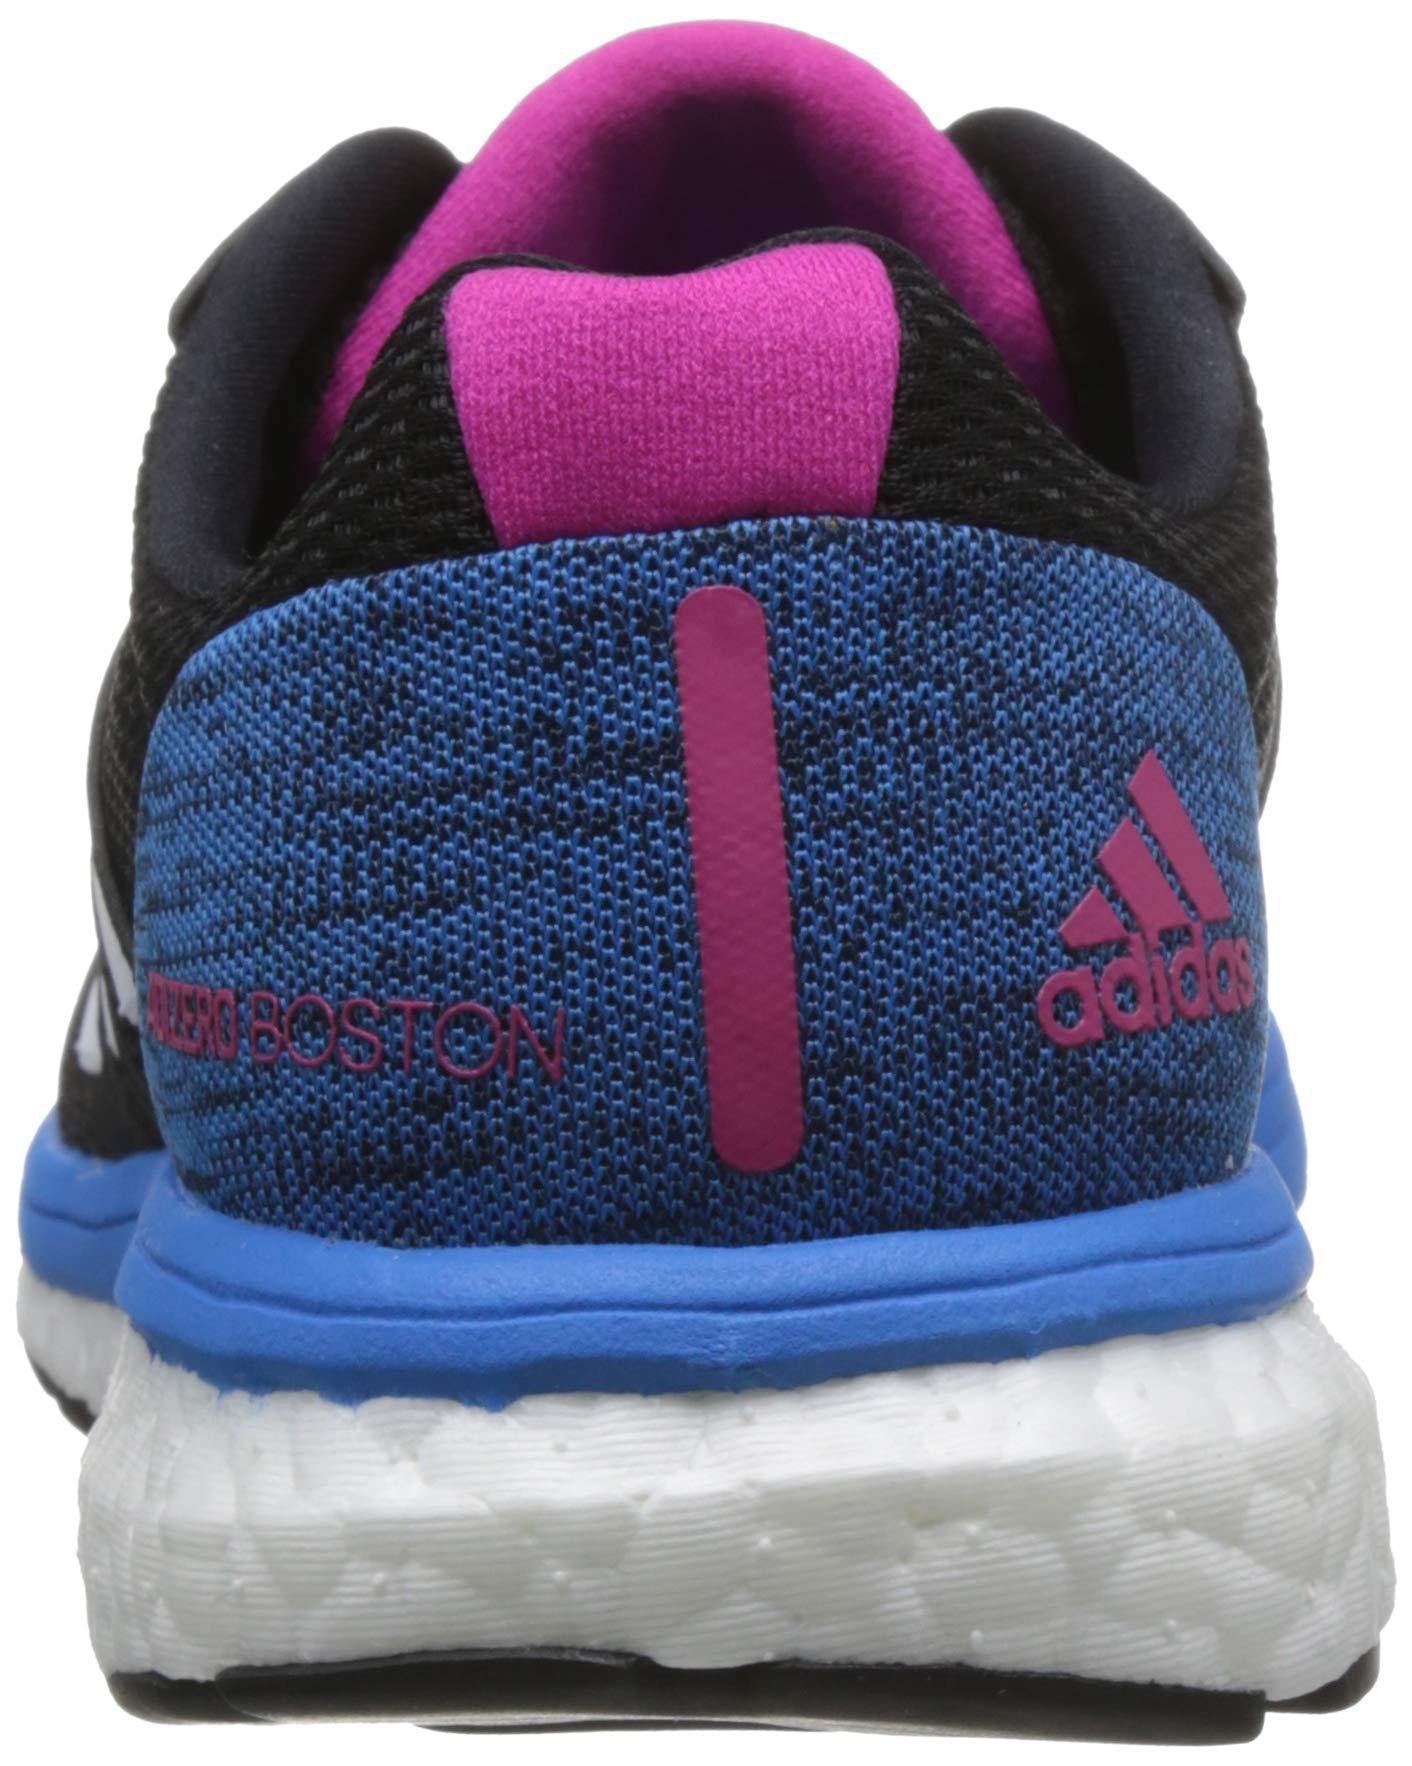 71yhBdt5 mL - adidas Women's Adizero Boston 7 W Running Shoes